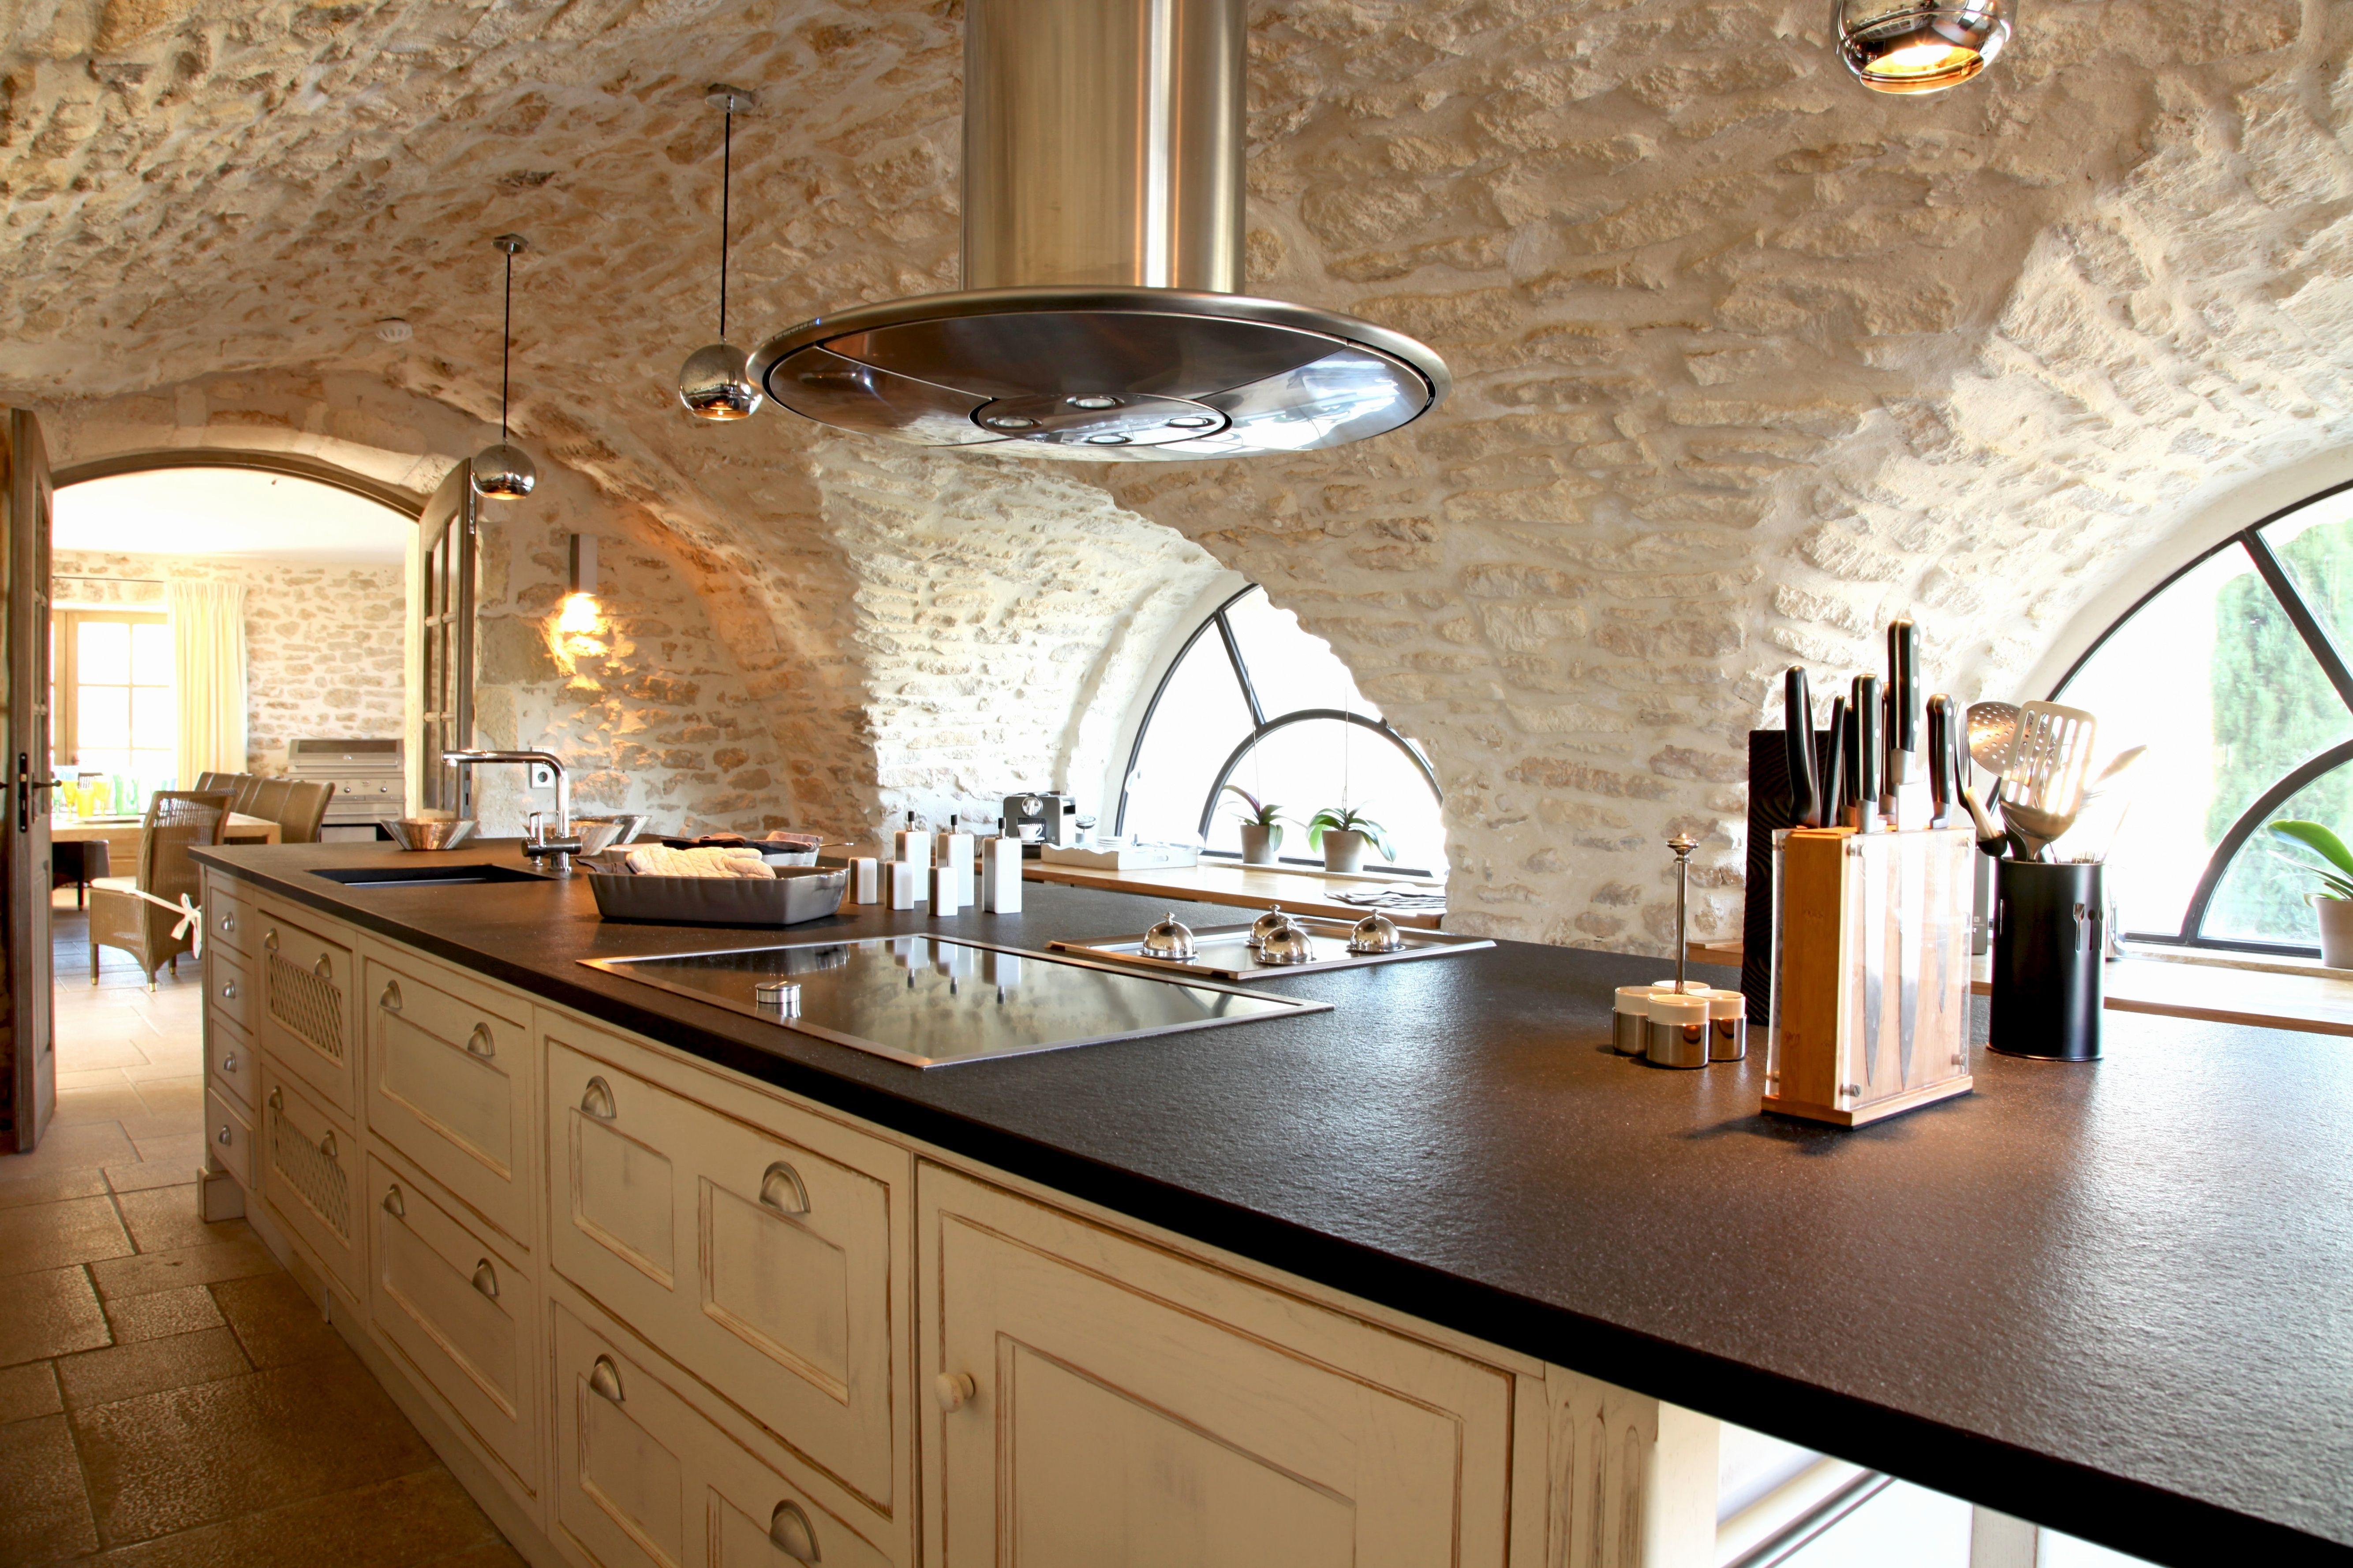 Cuisine Ancienne Et Moderne Deco Campagnarde Finest Dco Campagne